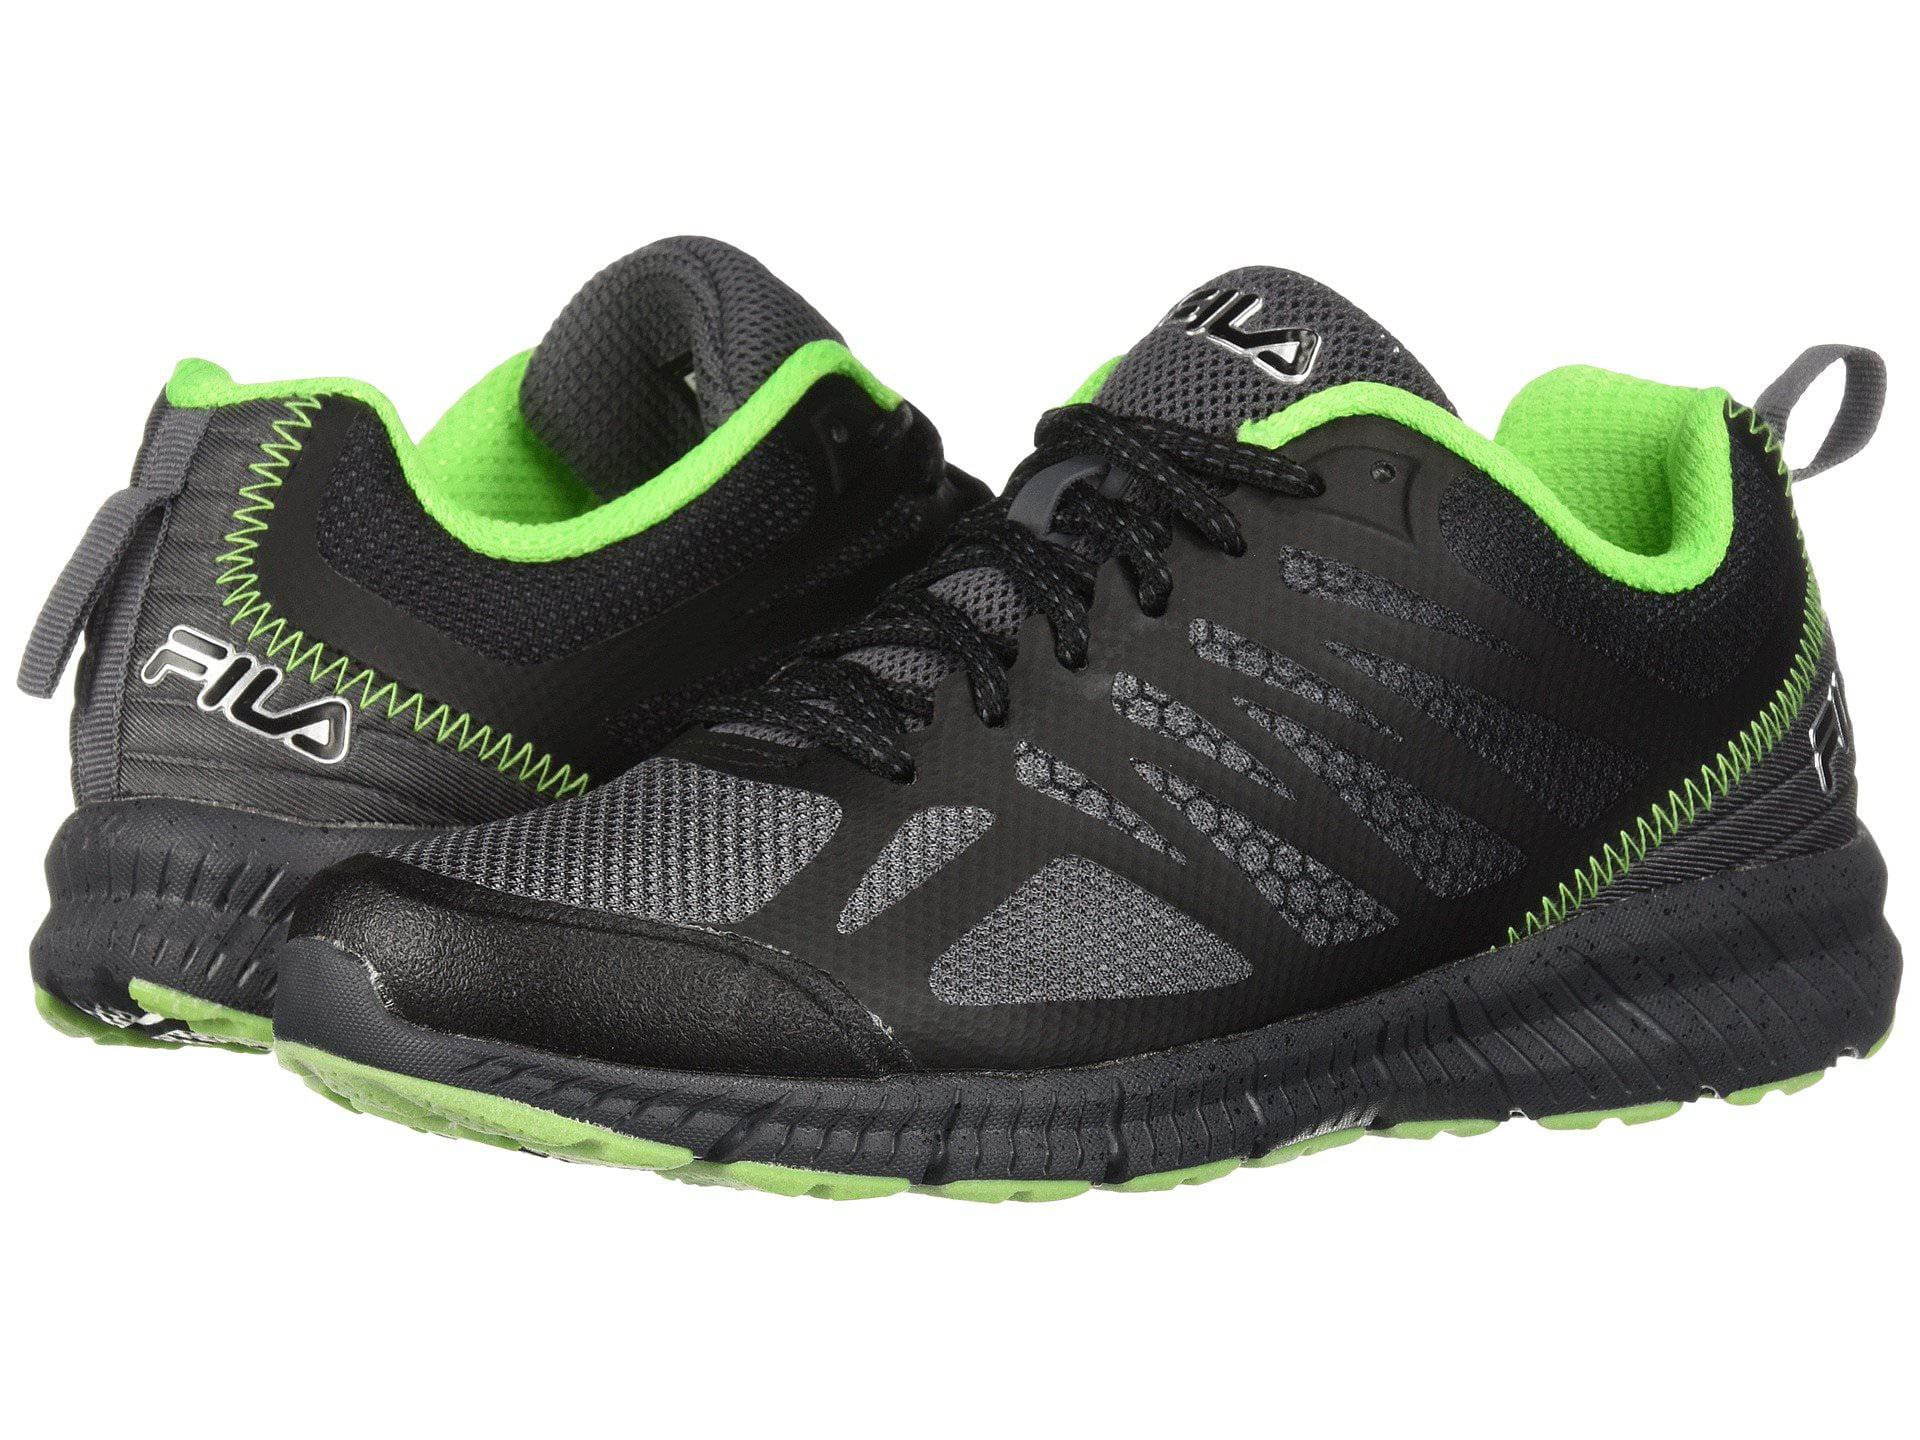 Fila Memory Speedstride Trail Mens Low Top Athletic Running Shoes (Dark Silver -Black -Green Gecko, 12 US MEN) by